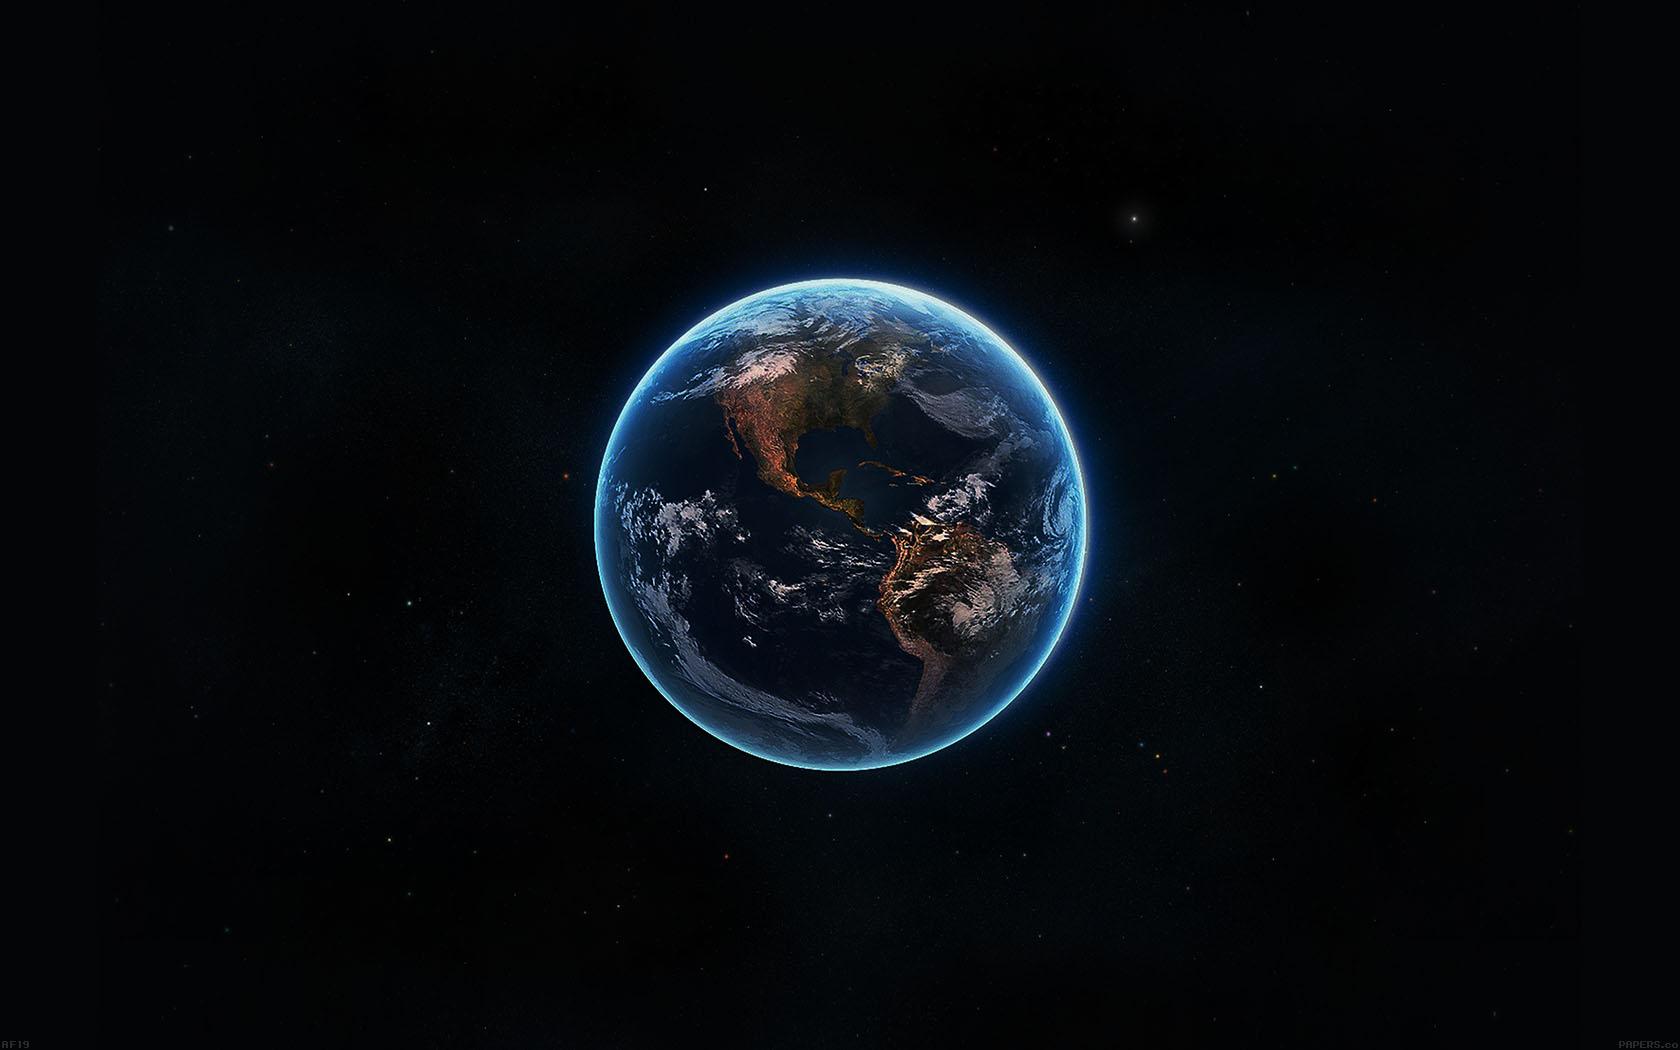 af19earthviewfromspaceamazingsatelliteillustart